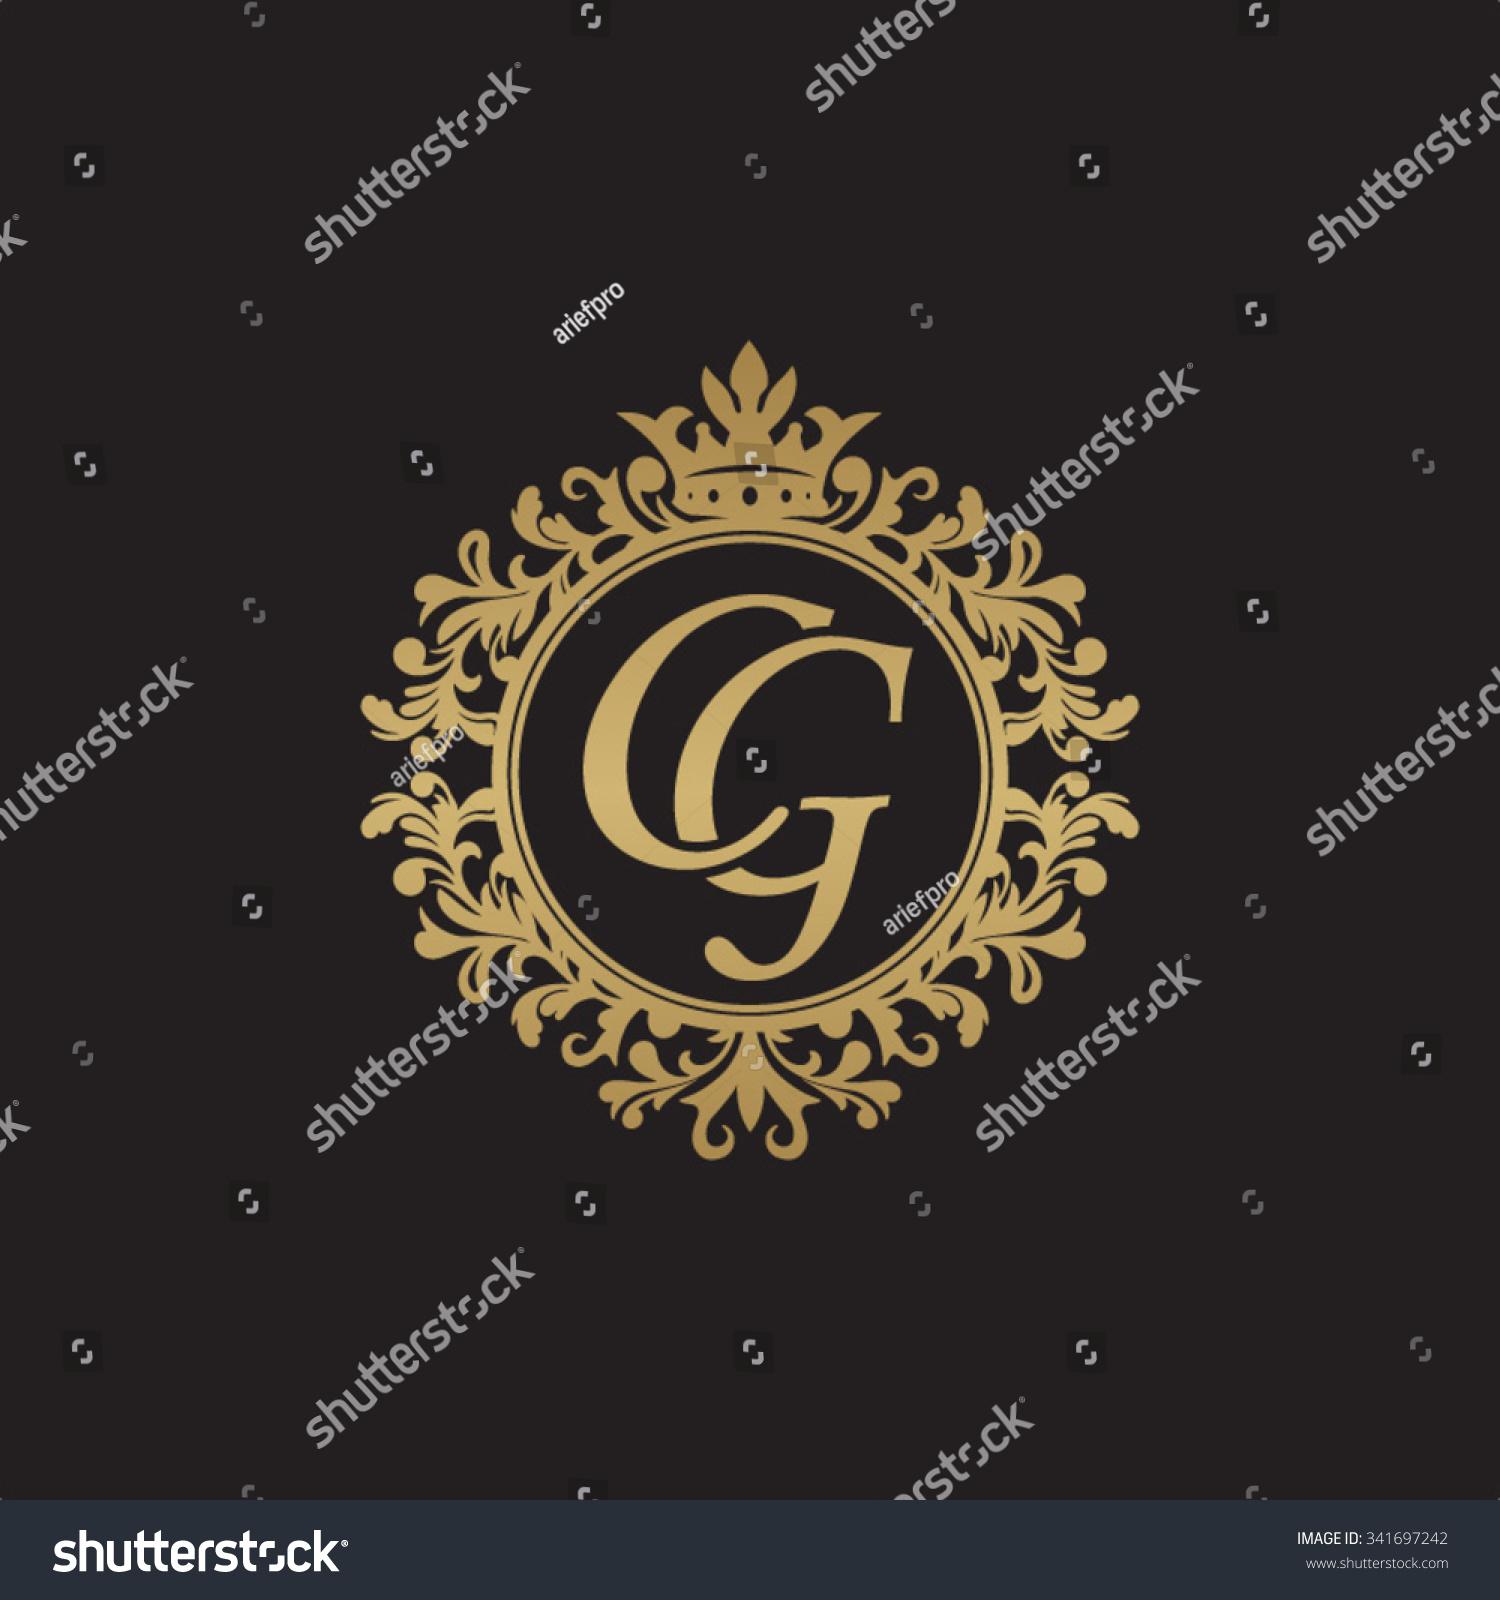 CG Initial Luxury Ornament Monogram Logo Vector de stock (libre de ...